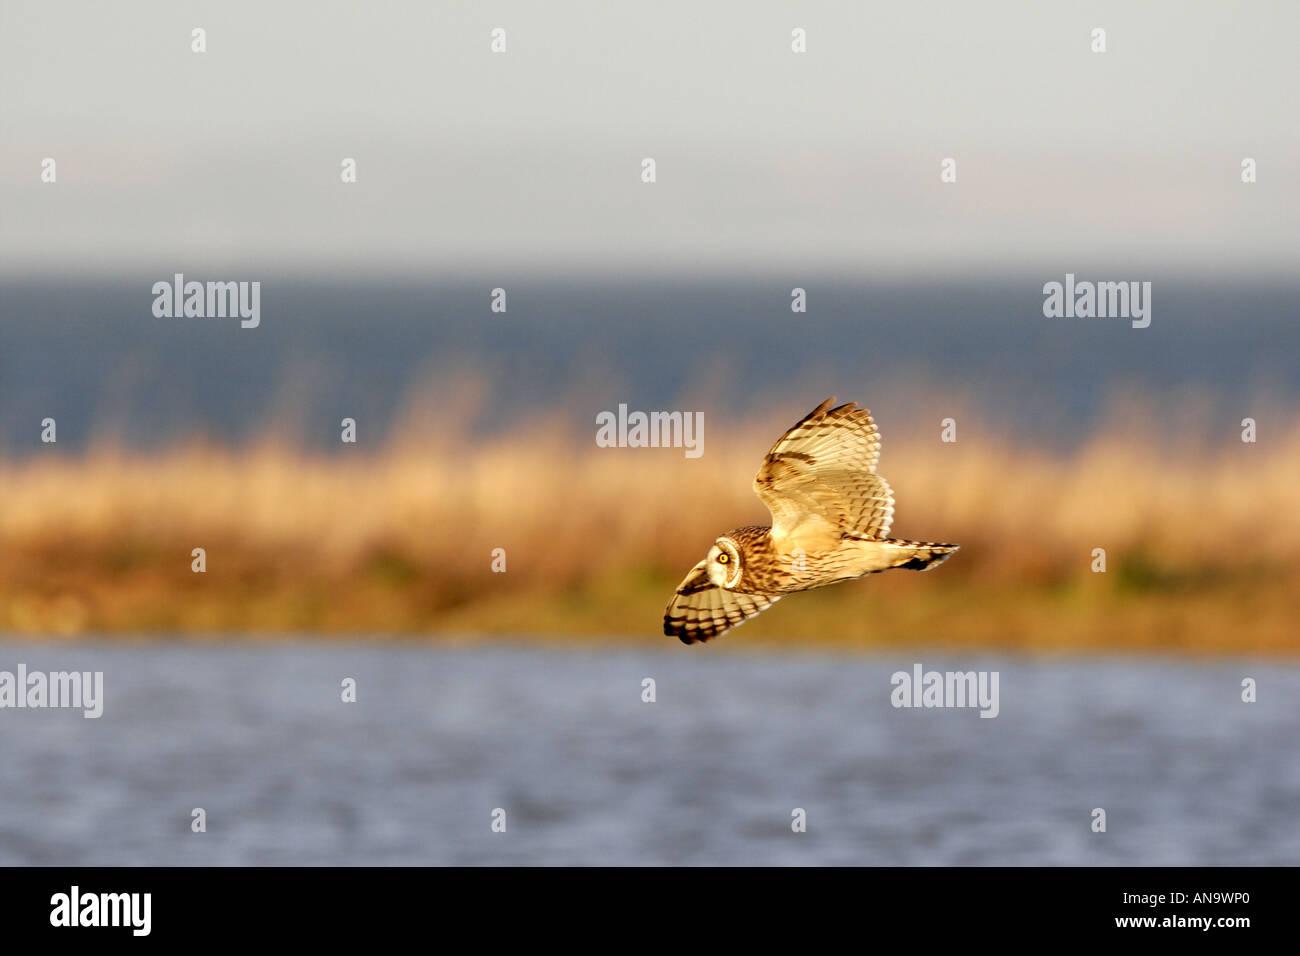 Sumpfohreule fliegen bei wintering Boden Stockfoto